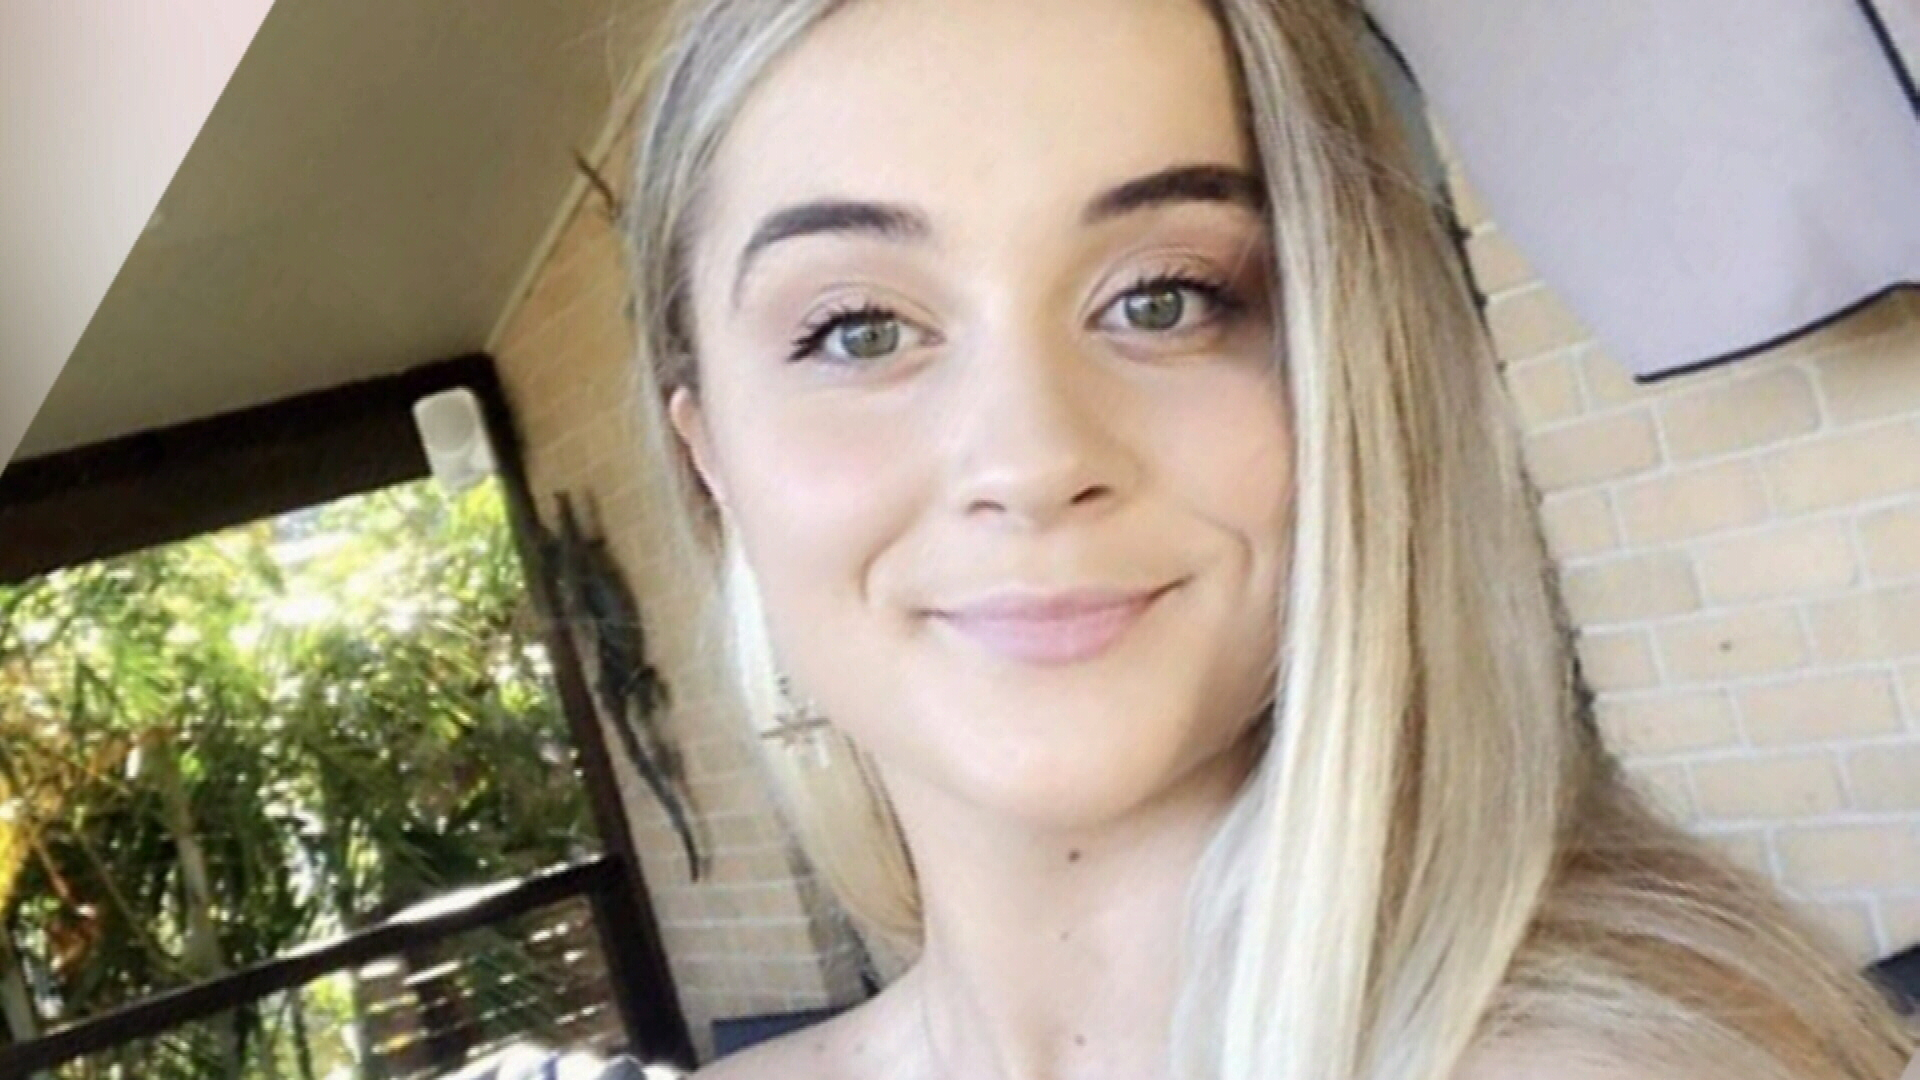 Teen girl identified as victim of FOMO festival 'overdose'